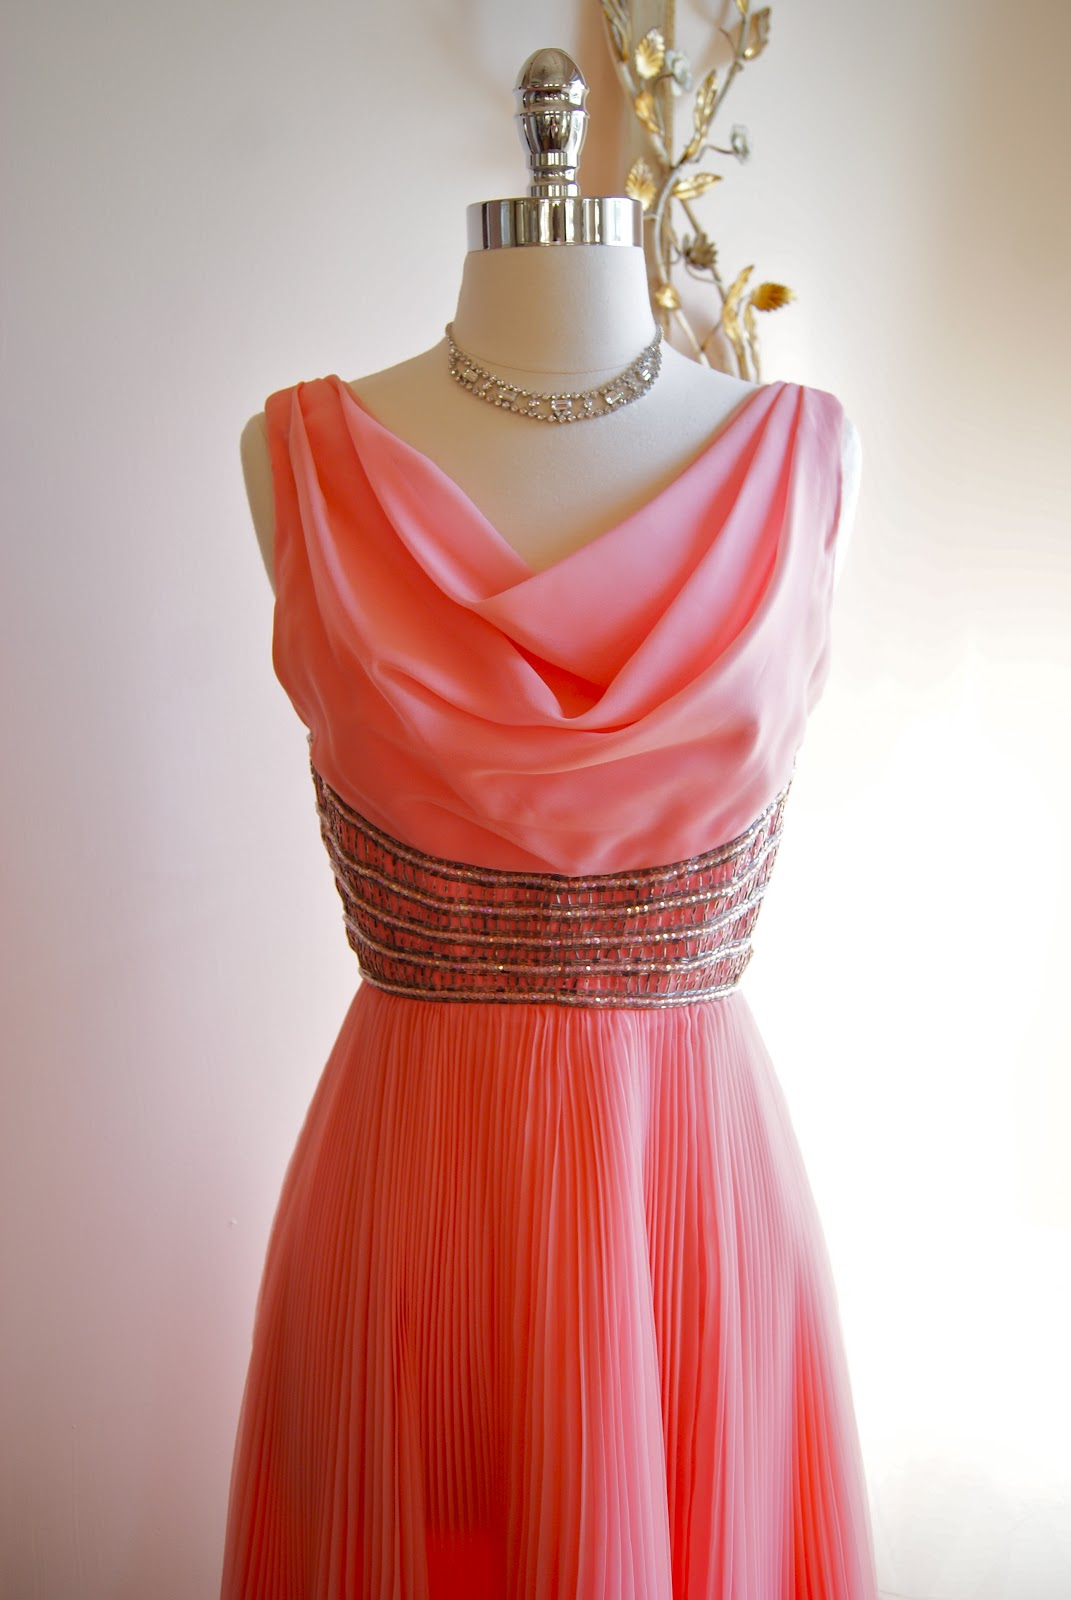 Xtabay Vintage Clothing Boutique - Portland, Oregon: Magic Moments...